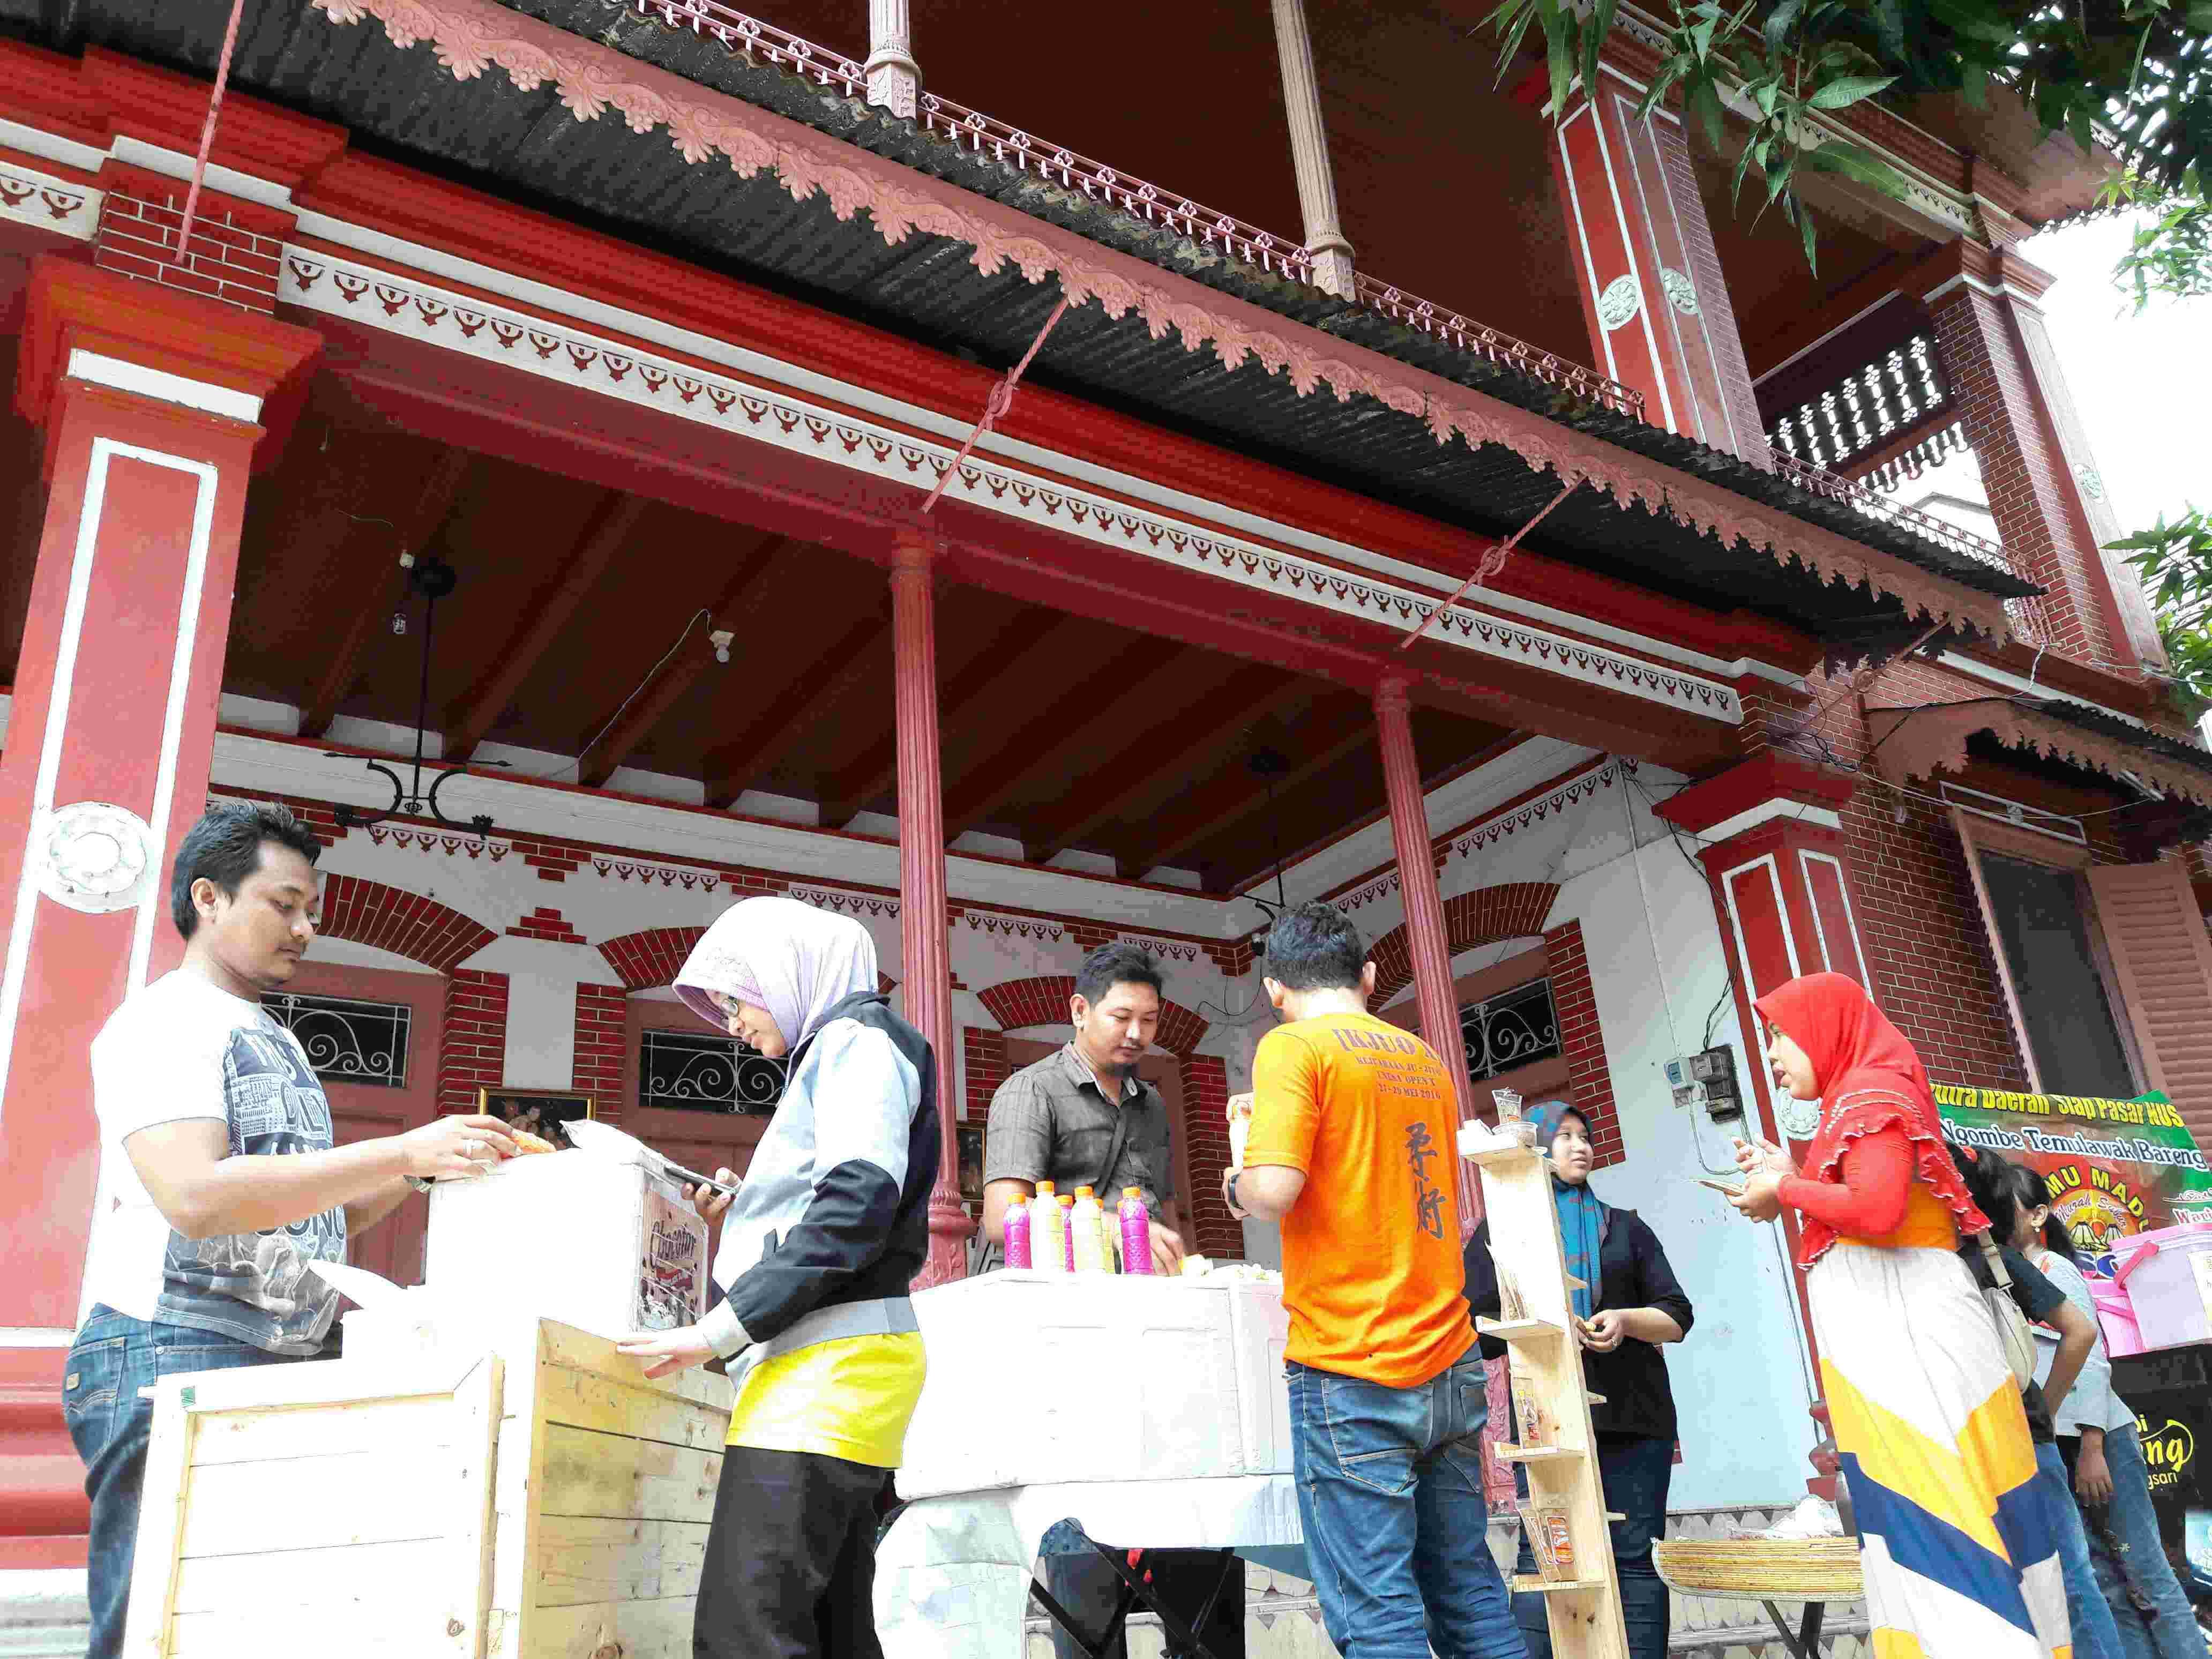 Pusat Oleh Ramaikan Kawasan Cagar Budaya Kampung Kemasan Gresik Kab